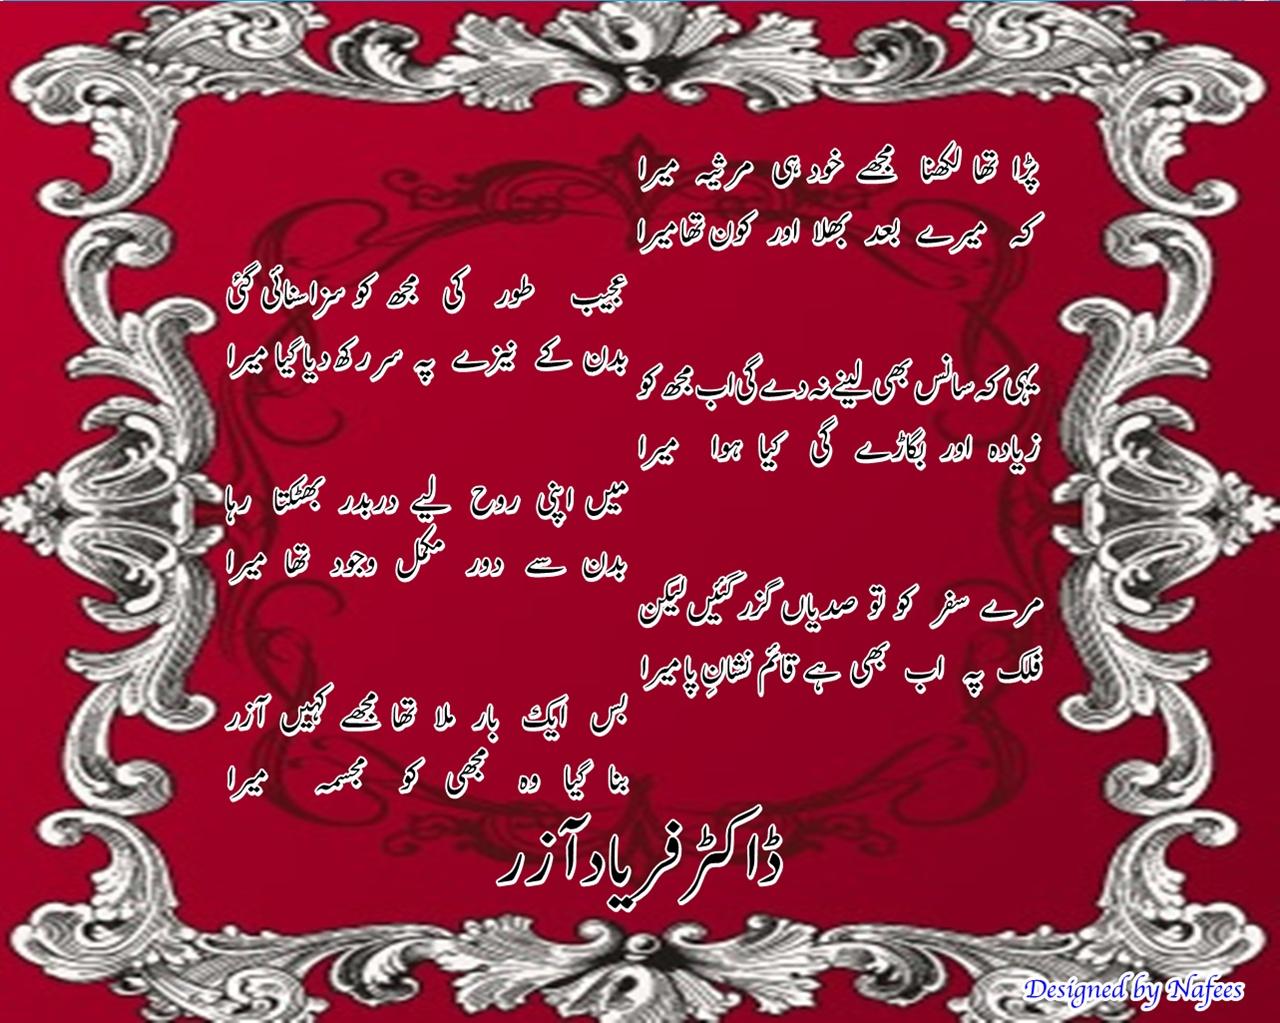 pada tha likhna mujhe khud hi marsia mera poetry cards